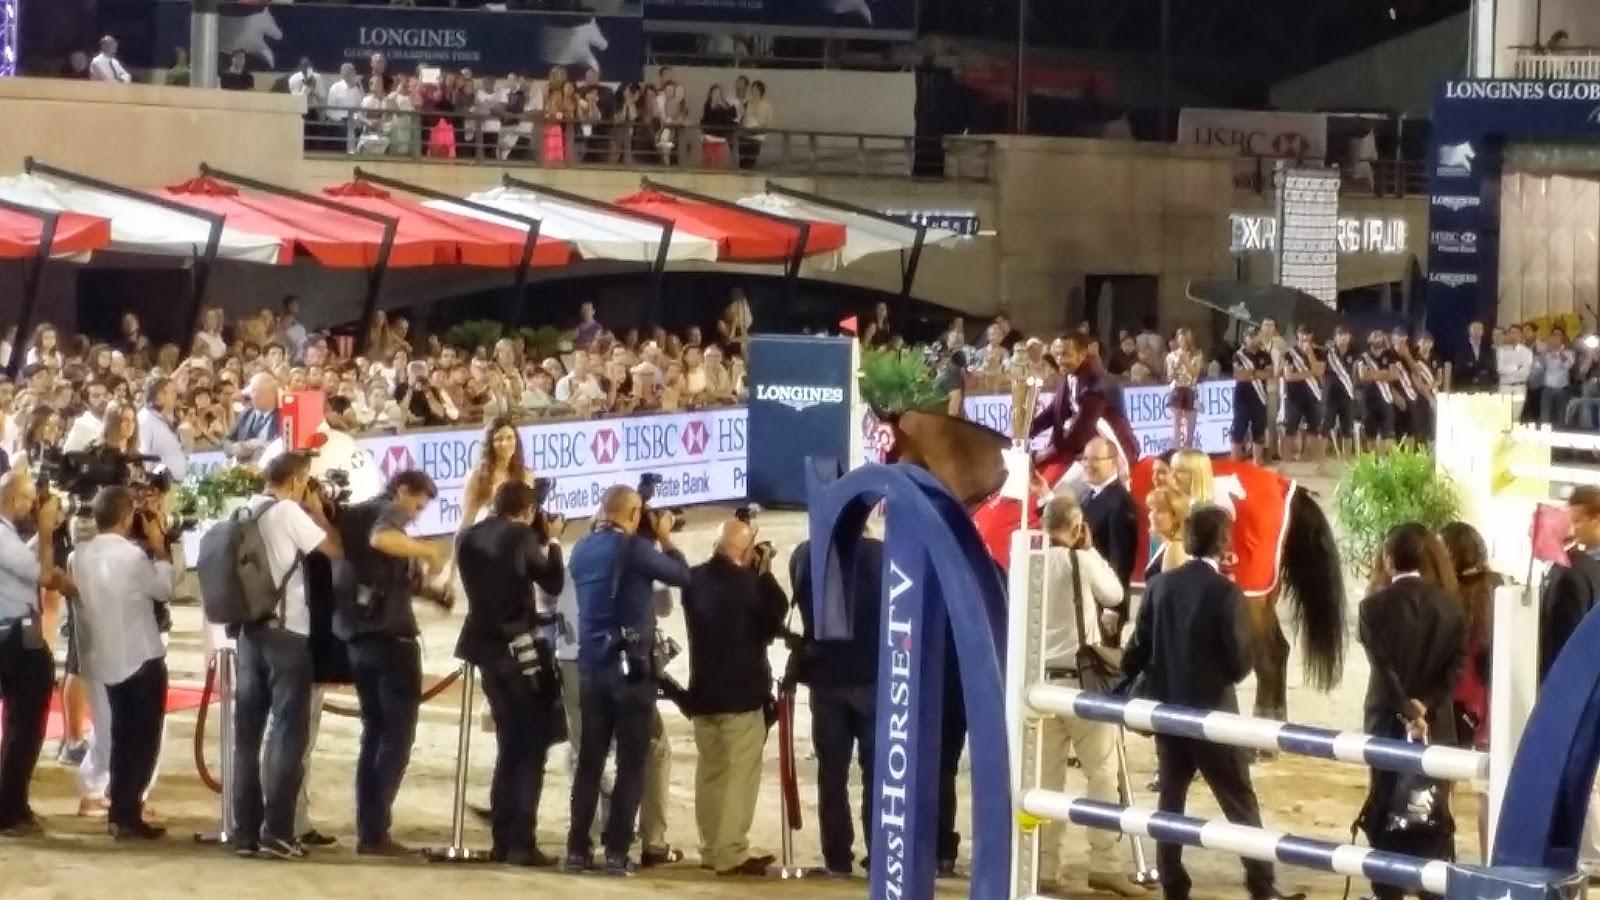 LONGINES Conquest, Global Champions Tour 2014 Montecarlo, Charlotte Casiraghi, Alberto di Monaco, Mohammed Bassem Hassan